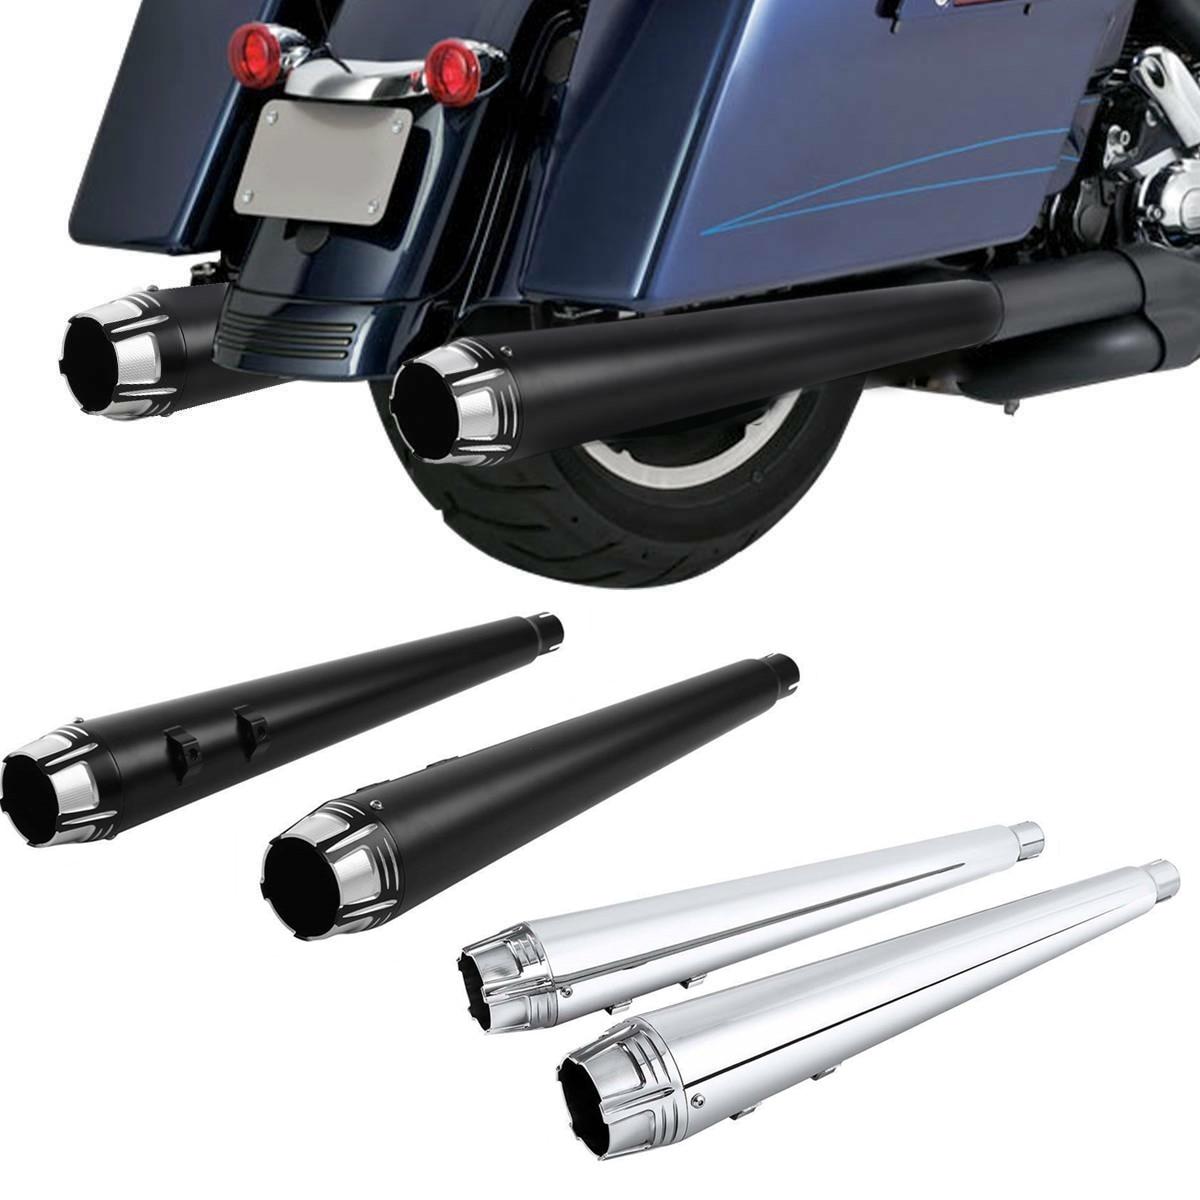 Black Megaphone Slip On Mufflers Exhaust Pipes Chrome Tips Harley Touring Bagger